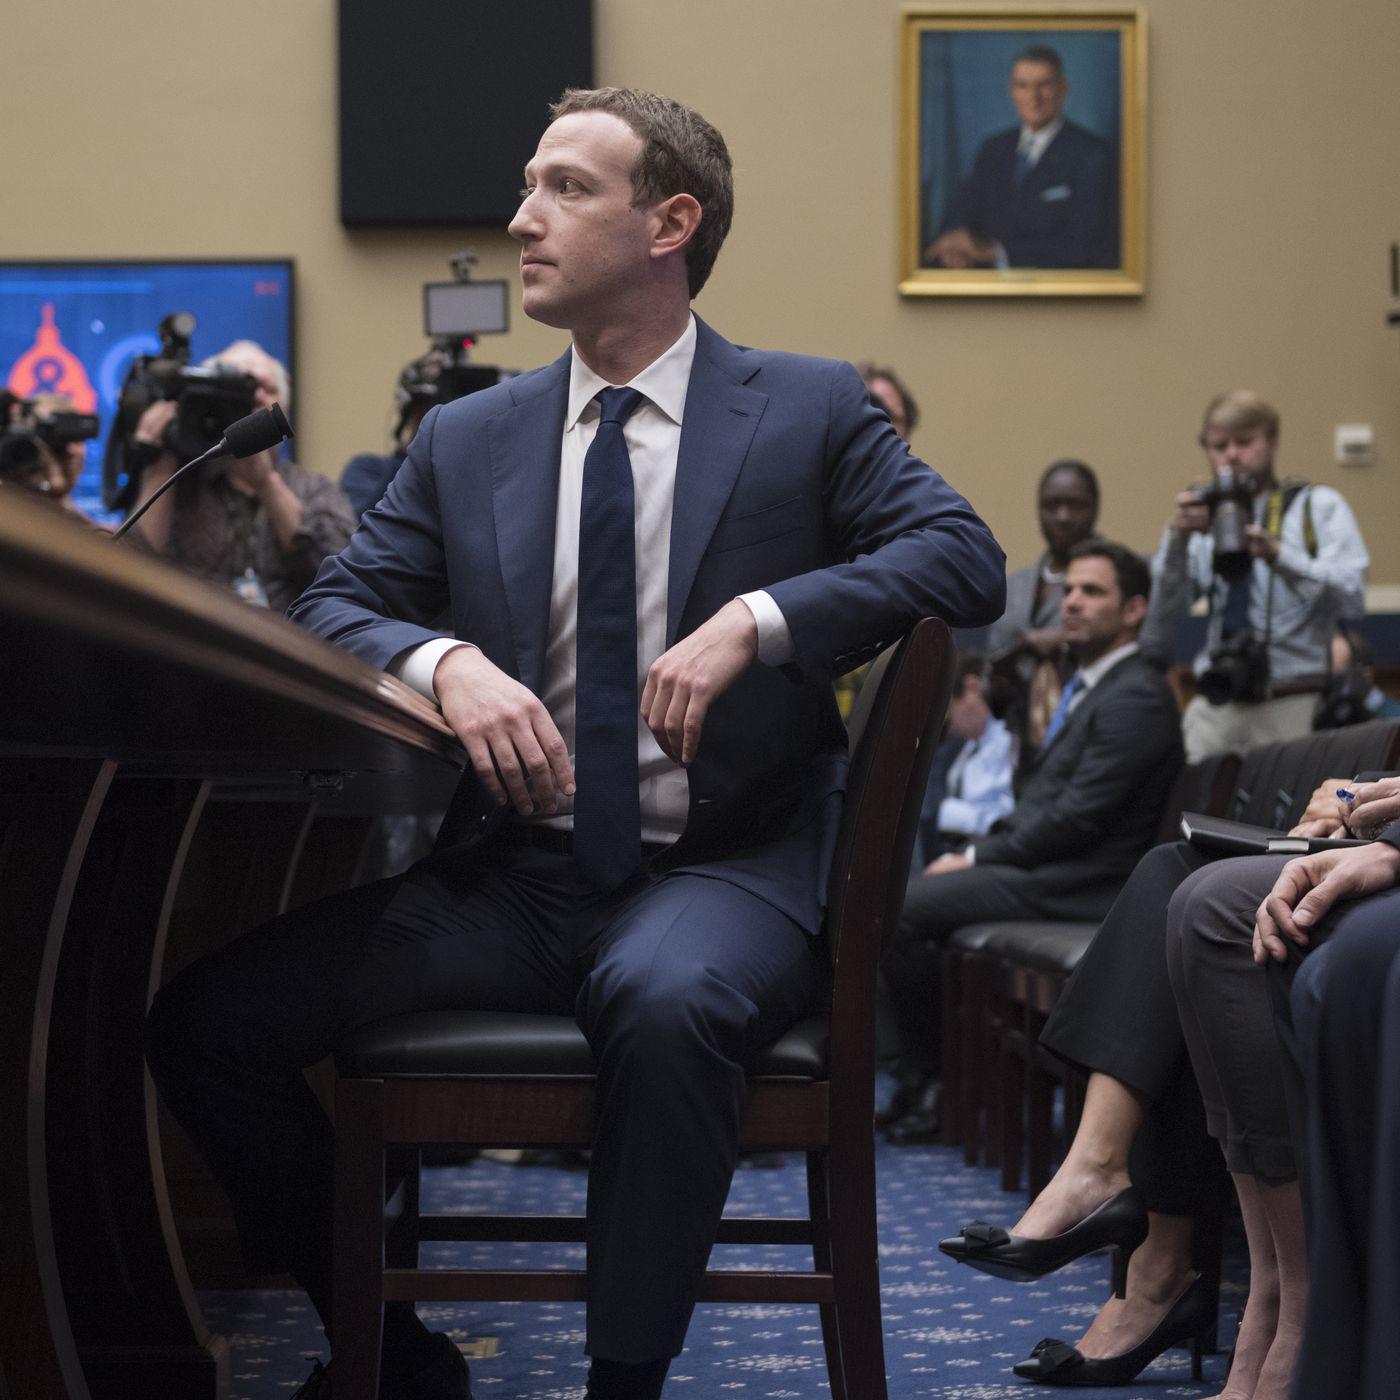 ec05a30141e Facebook CEO Mark Zuckerberg Wears Suit for Congressional Testimony - Racked